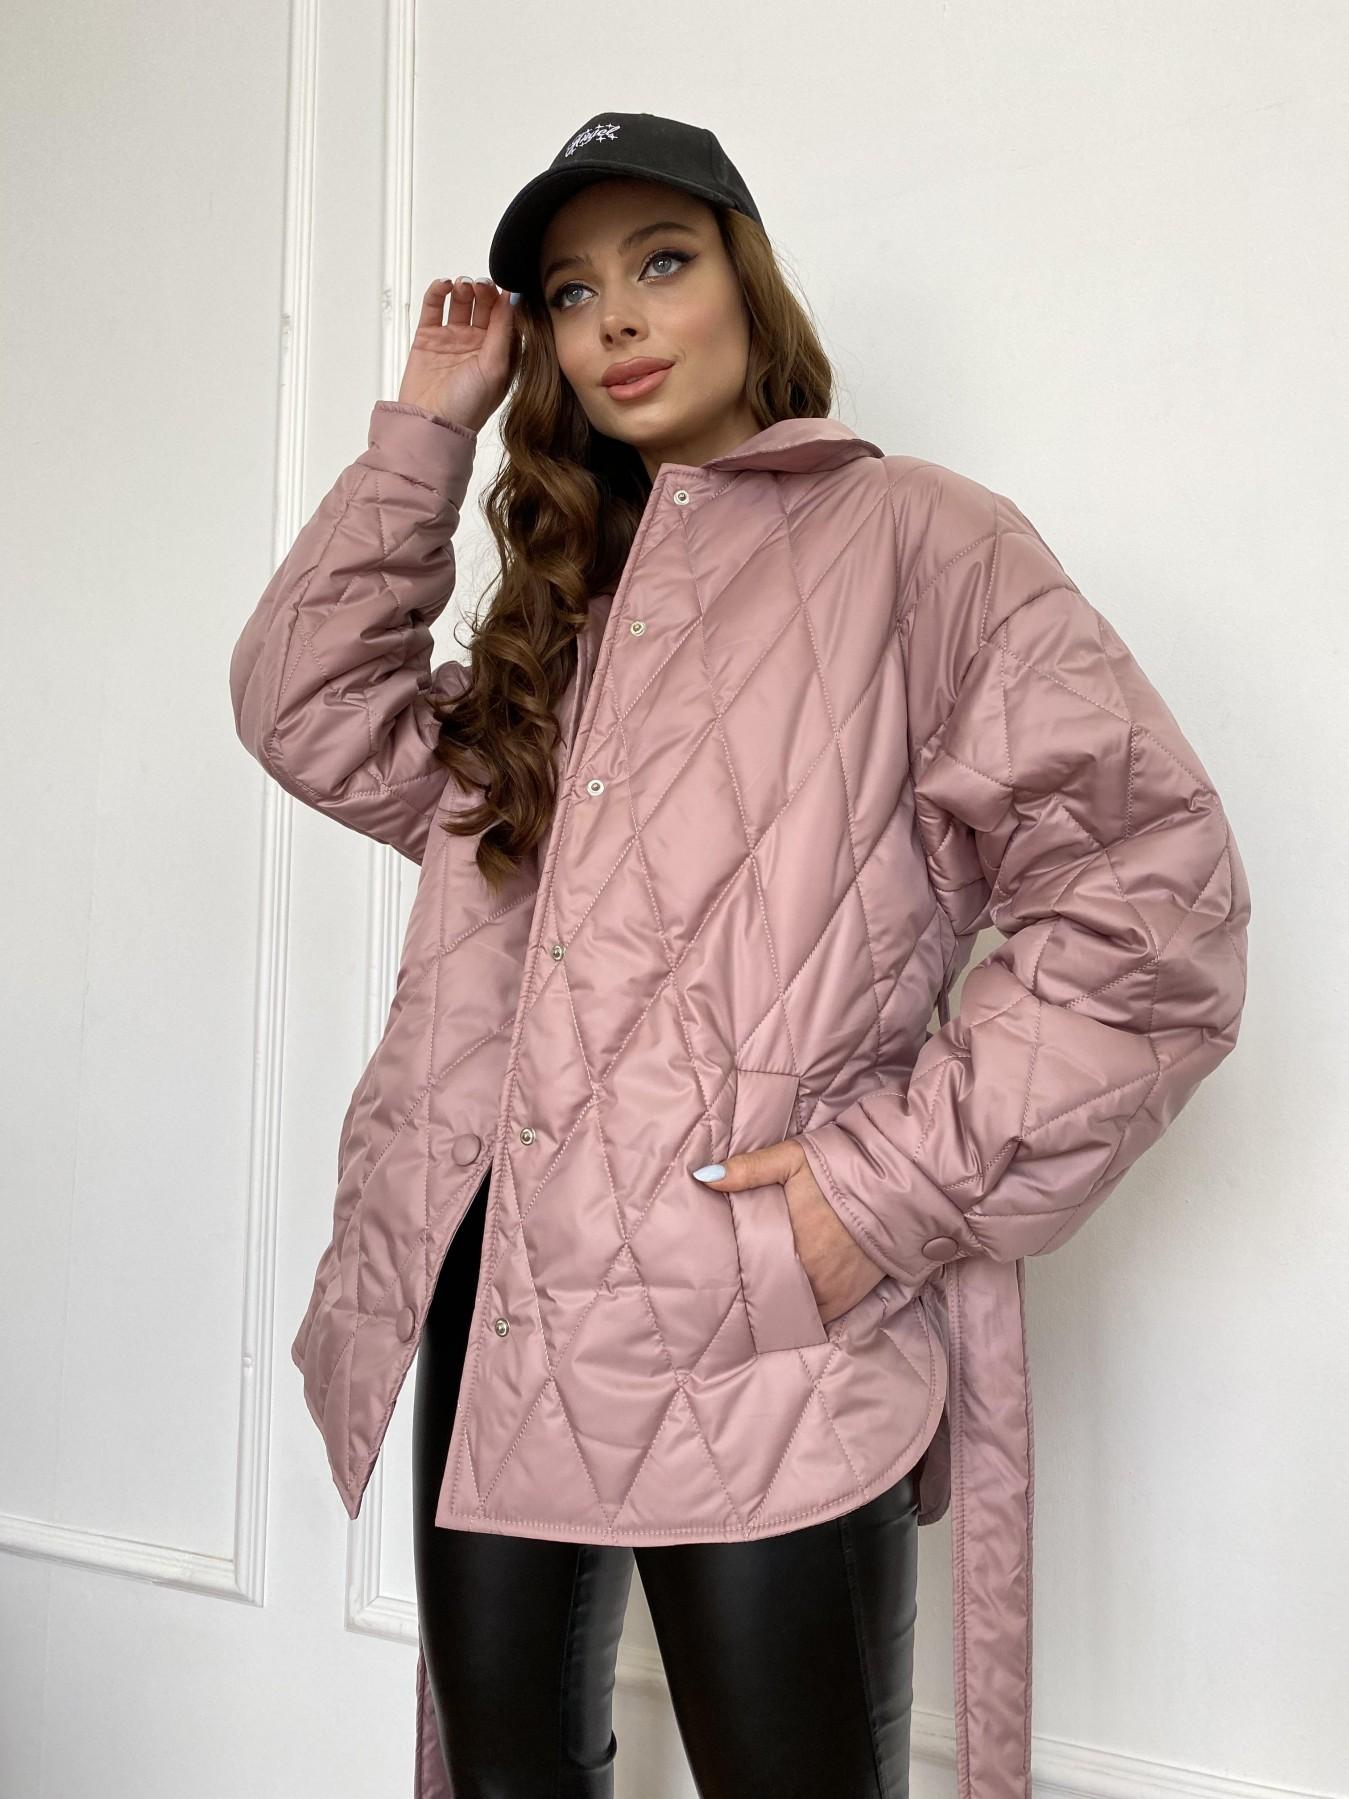 Моно  куртка из плащевой ткани Gloria 11081 АРТ. 47647 Цвет: Пудра - фото 12, интернет магазин tm-modus.ru